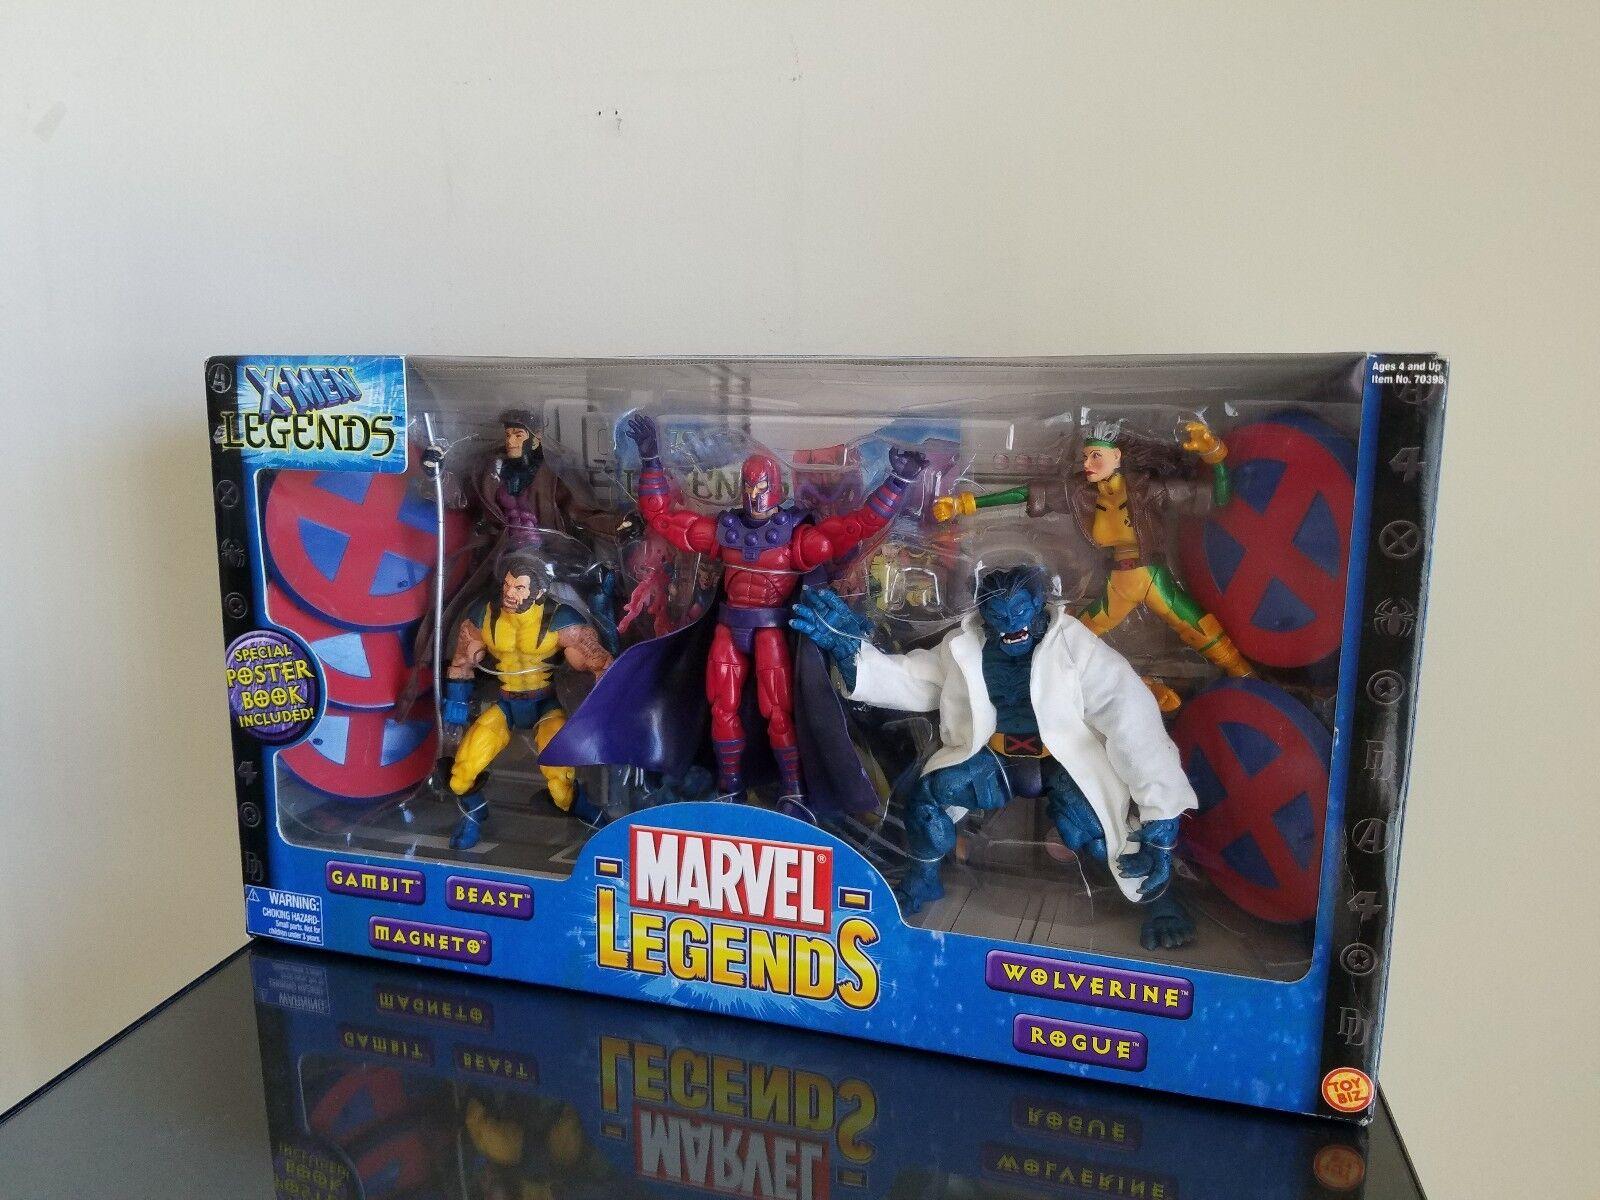 MARVEL LEGENDS X-MEN LEGENDS 5 FIGURE BOX SET Toy Biz